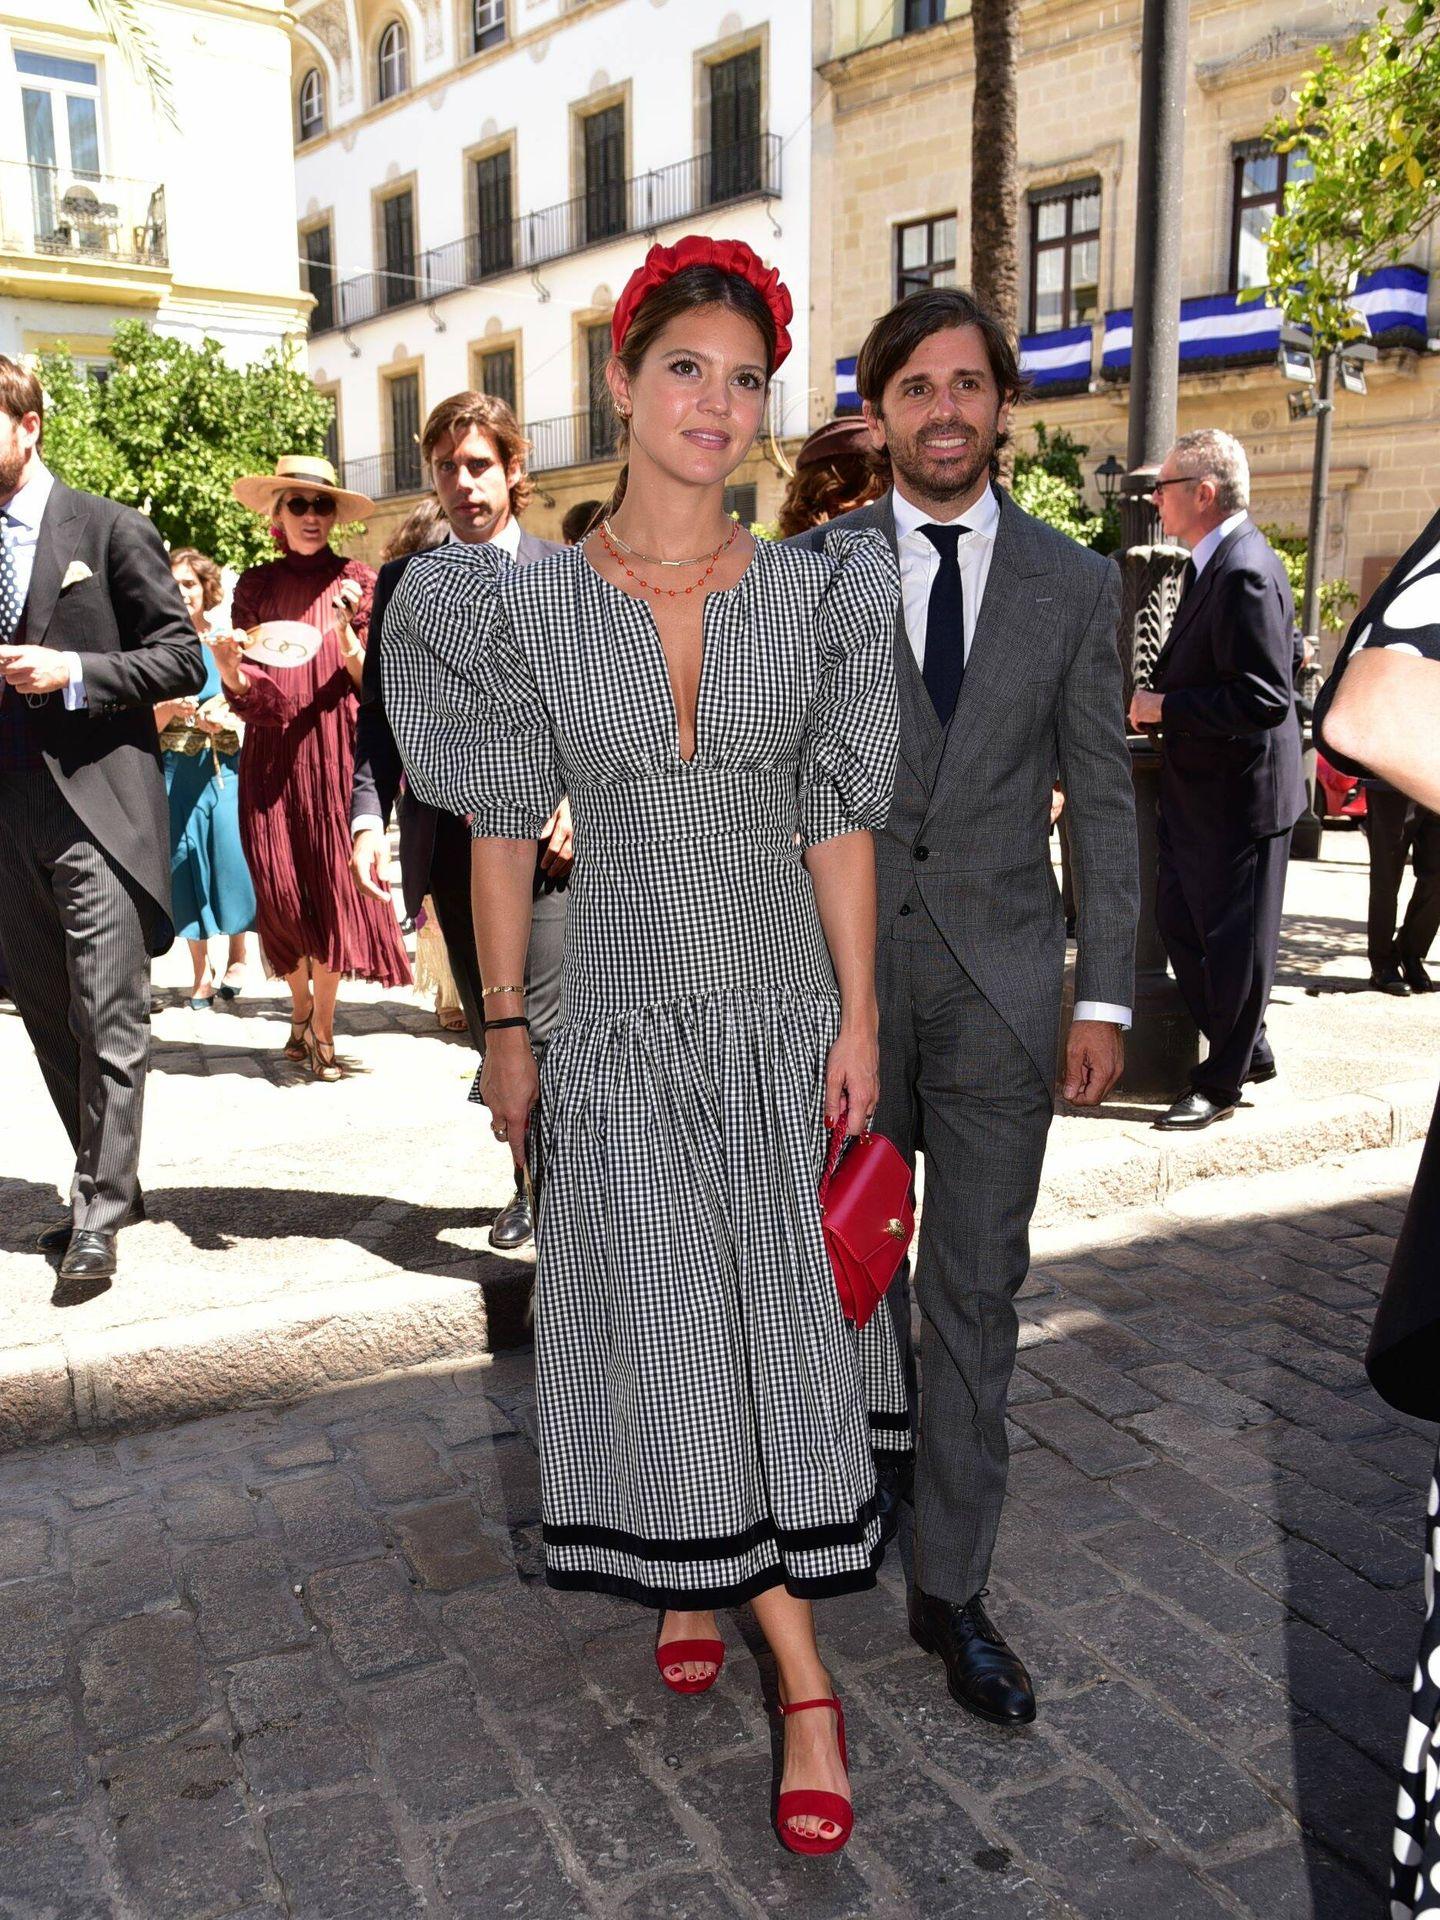 Isabelle Junot y Álvaro Falcó, marqués de Cubas. (Cordon Press)